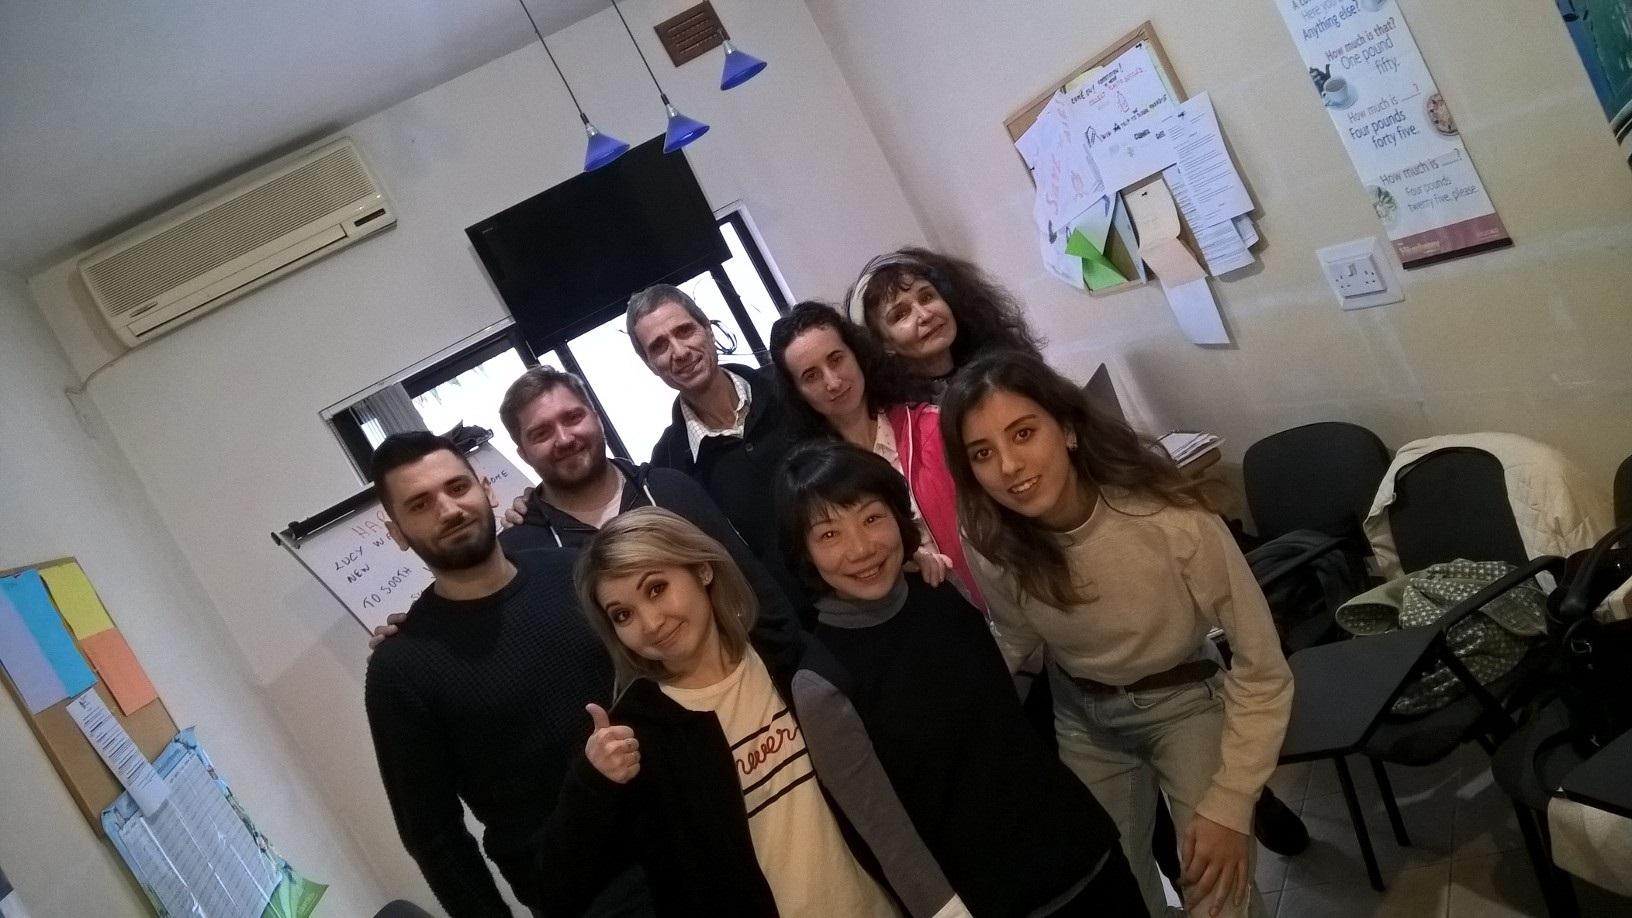 GSE Malta sprachreisen intercambio scuola di inglese sprachschule cours d'anglais cursos idiomas английский в Мальта